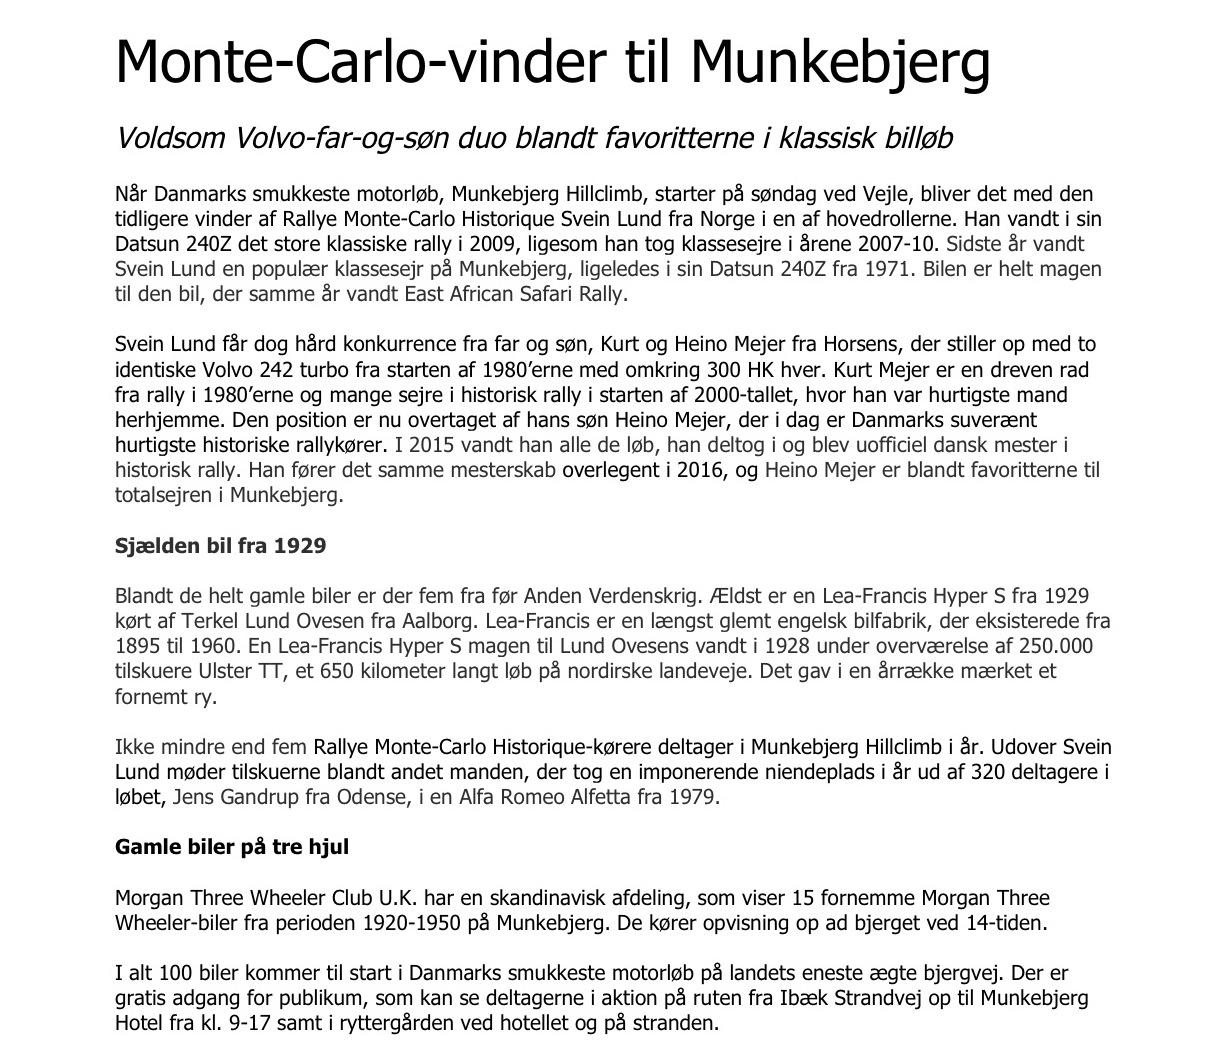 PM 2 Monte-Carlo-vinder til Munkebjerg